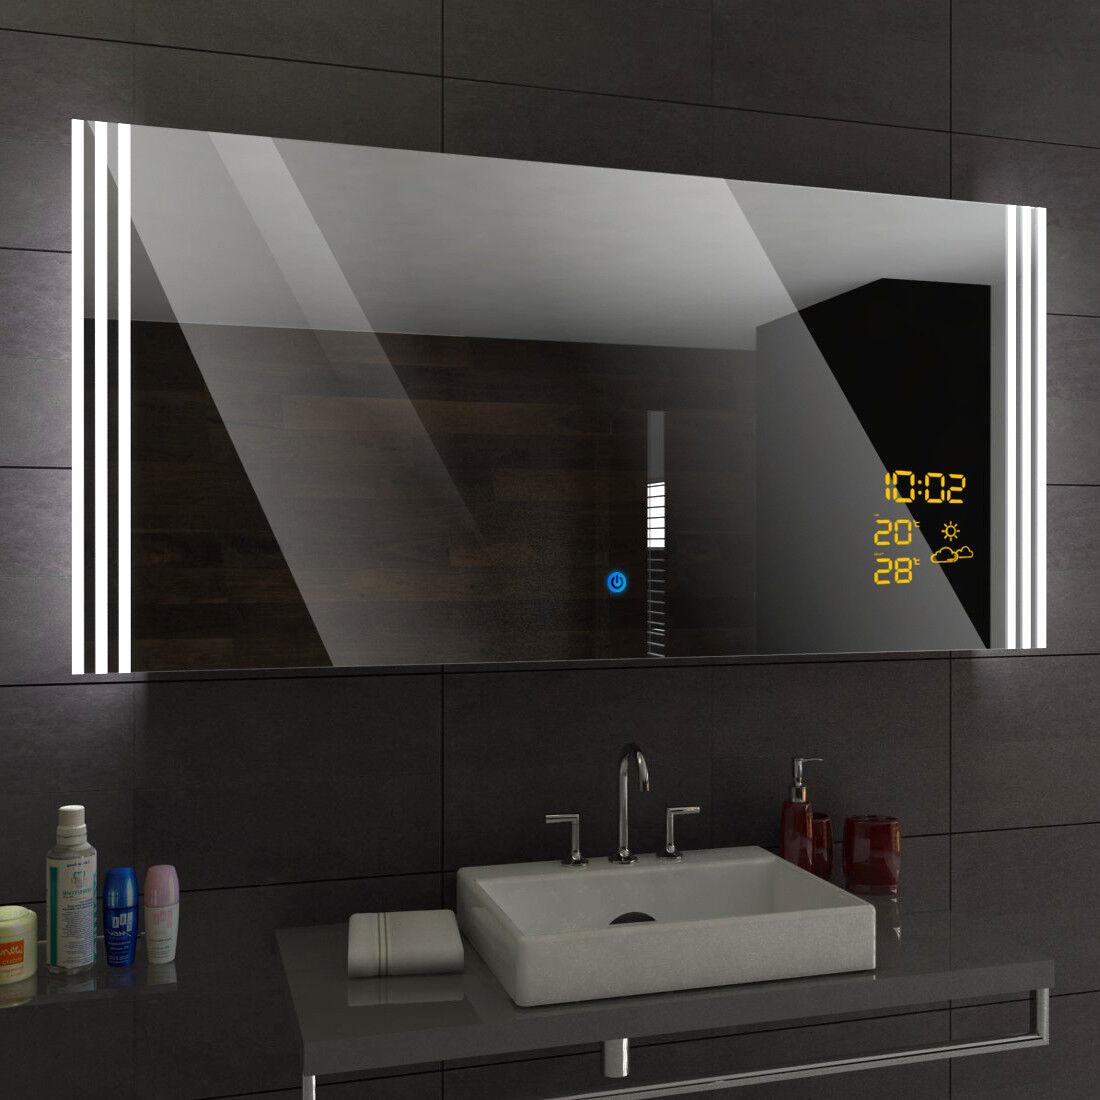 Illumination LED miroir sur mesure eclairage salle de bain ARICA